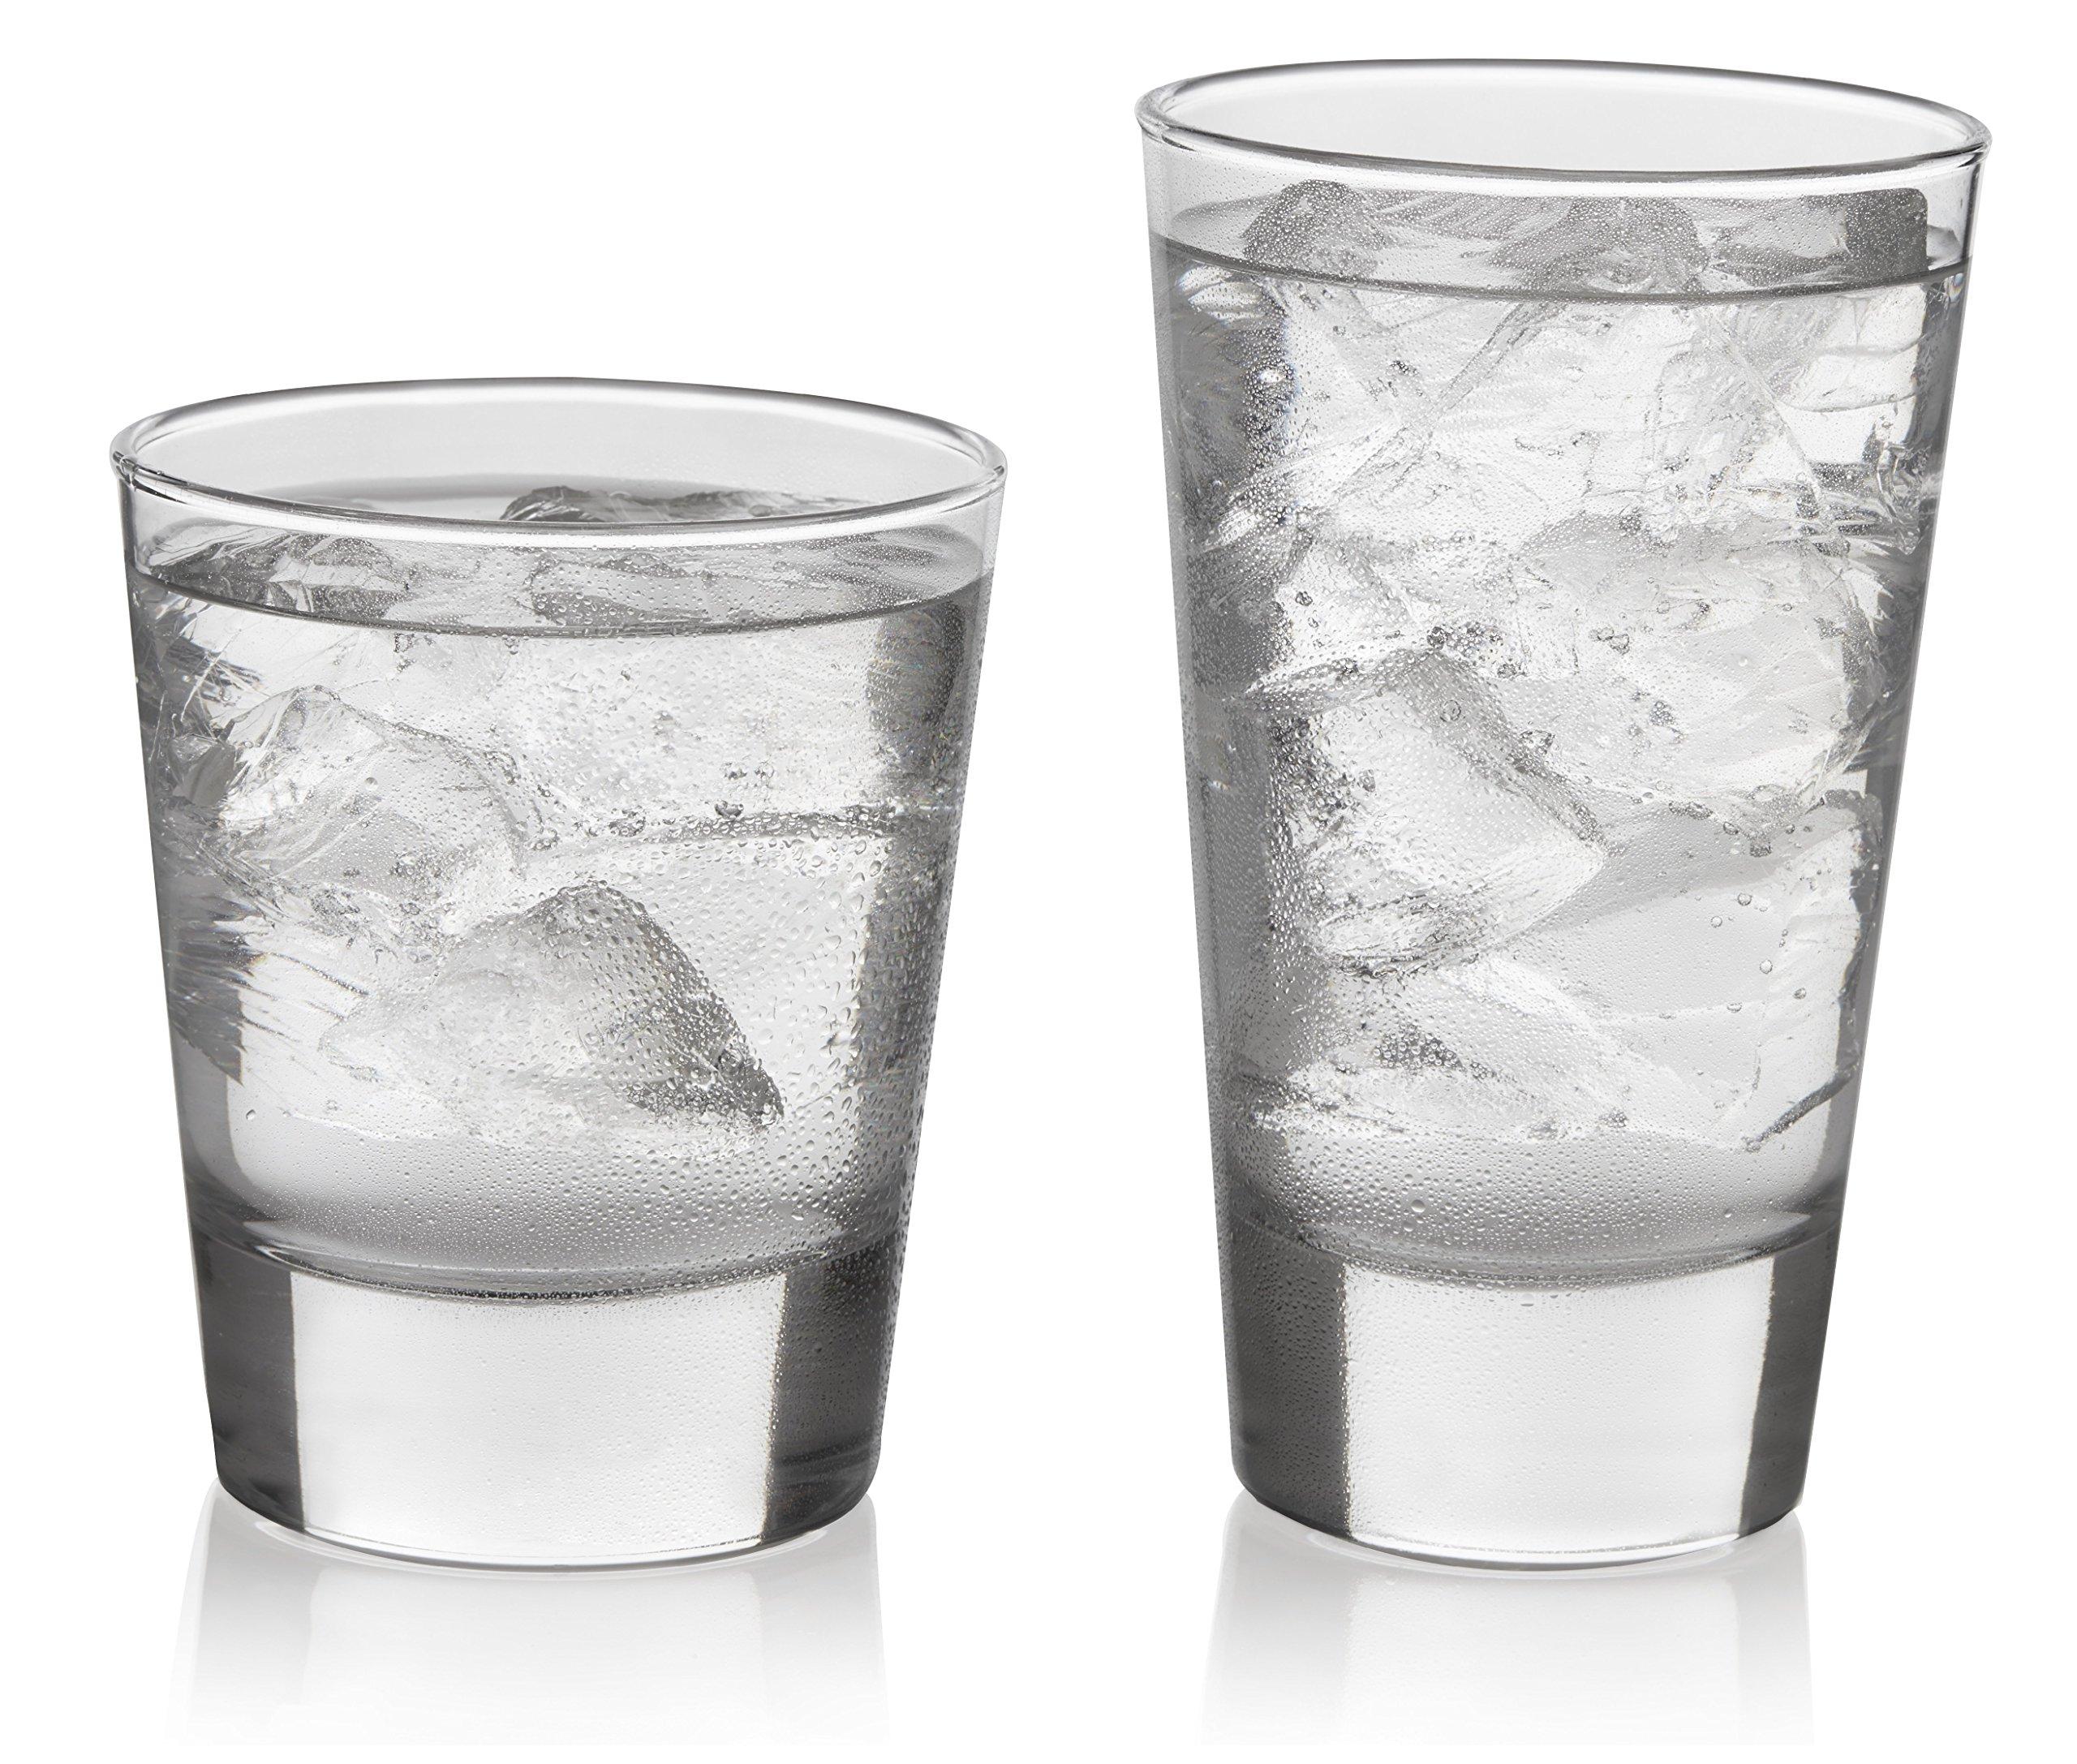 Libbey Geo Glass Drinkware Combination Set, 8-15.5 ounce Drinking Glasses & 8-13.25 ounce Rocks Glasses, Lead-Free, 16-piece